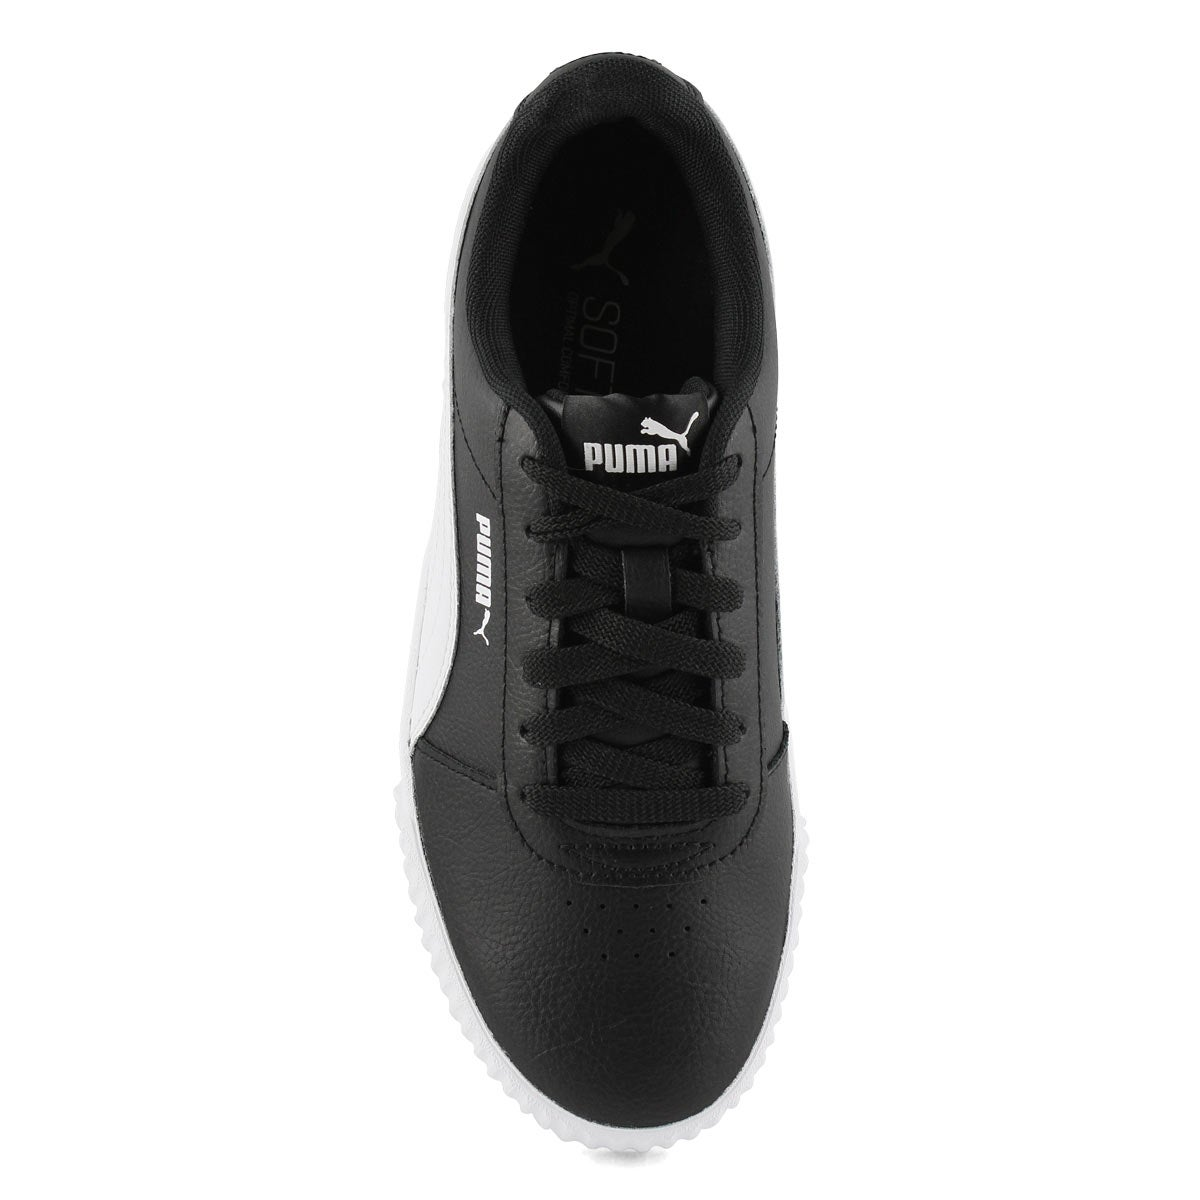 Women's Carina Sneaker - Black/ White